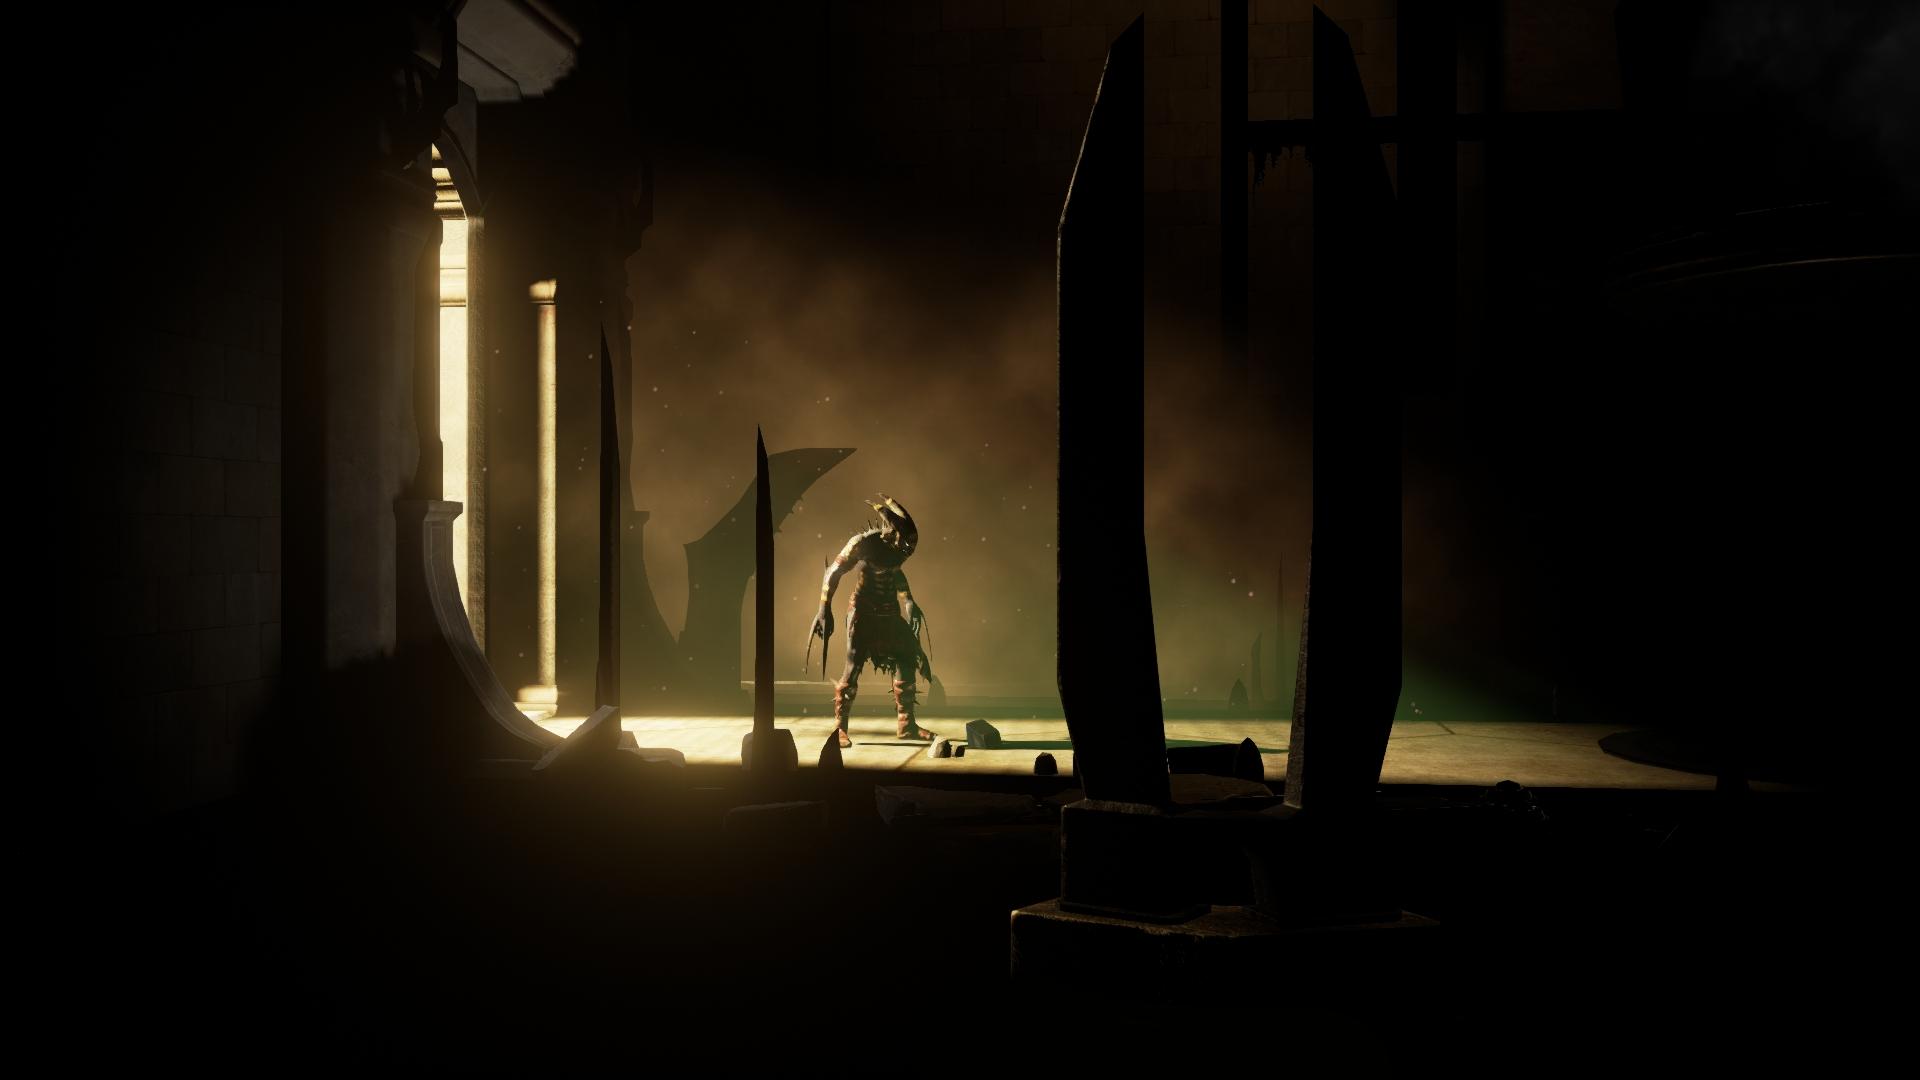 Galerie: Horizon, Uncharted 4, Last Guardian, Until Dawn 110300